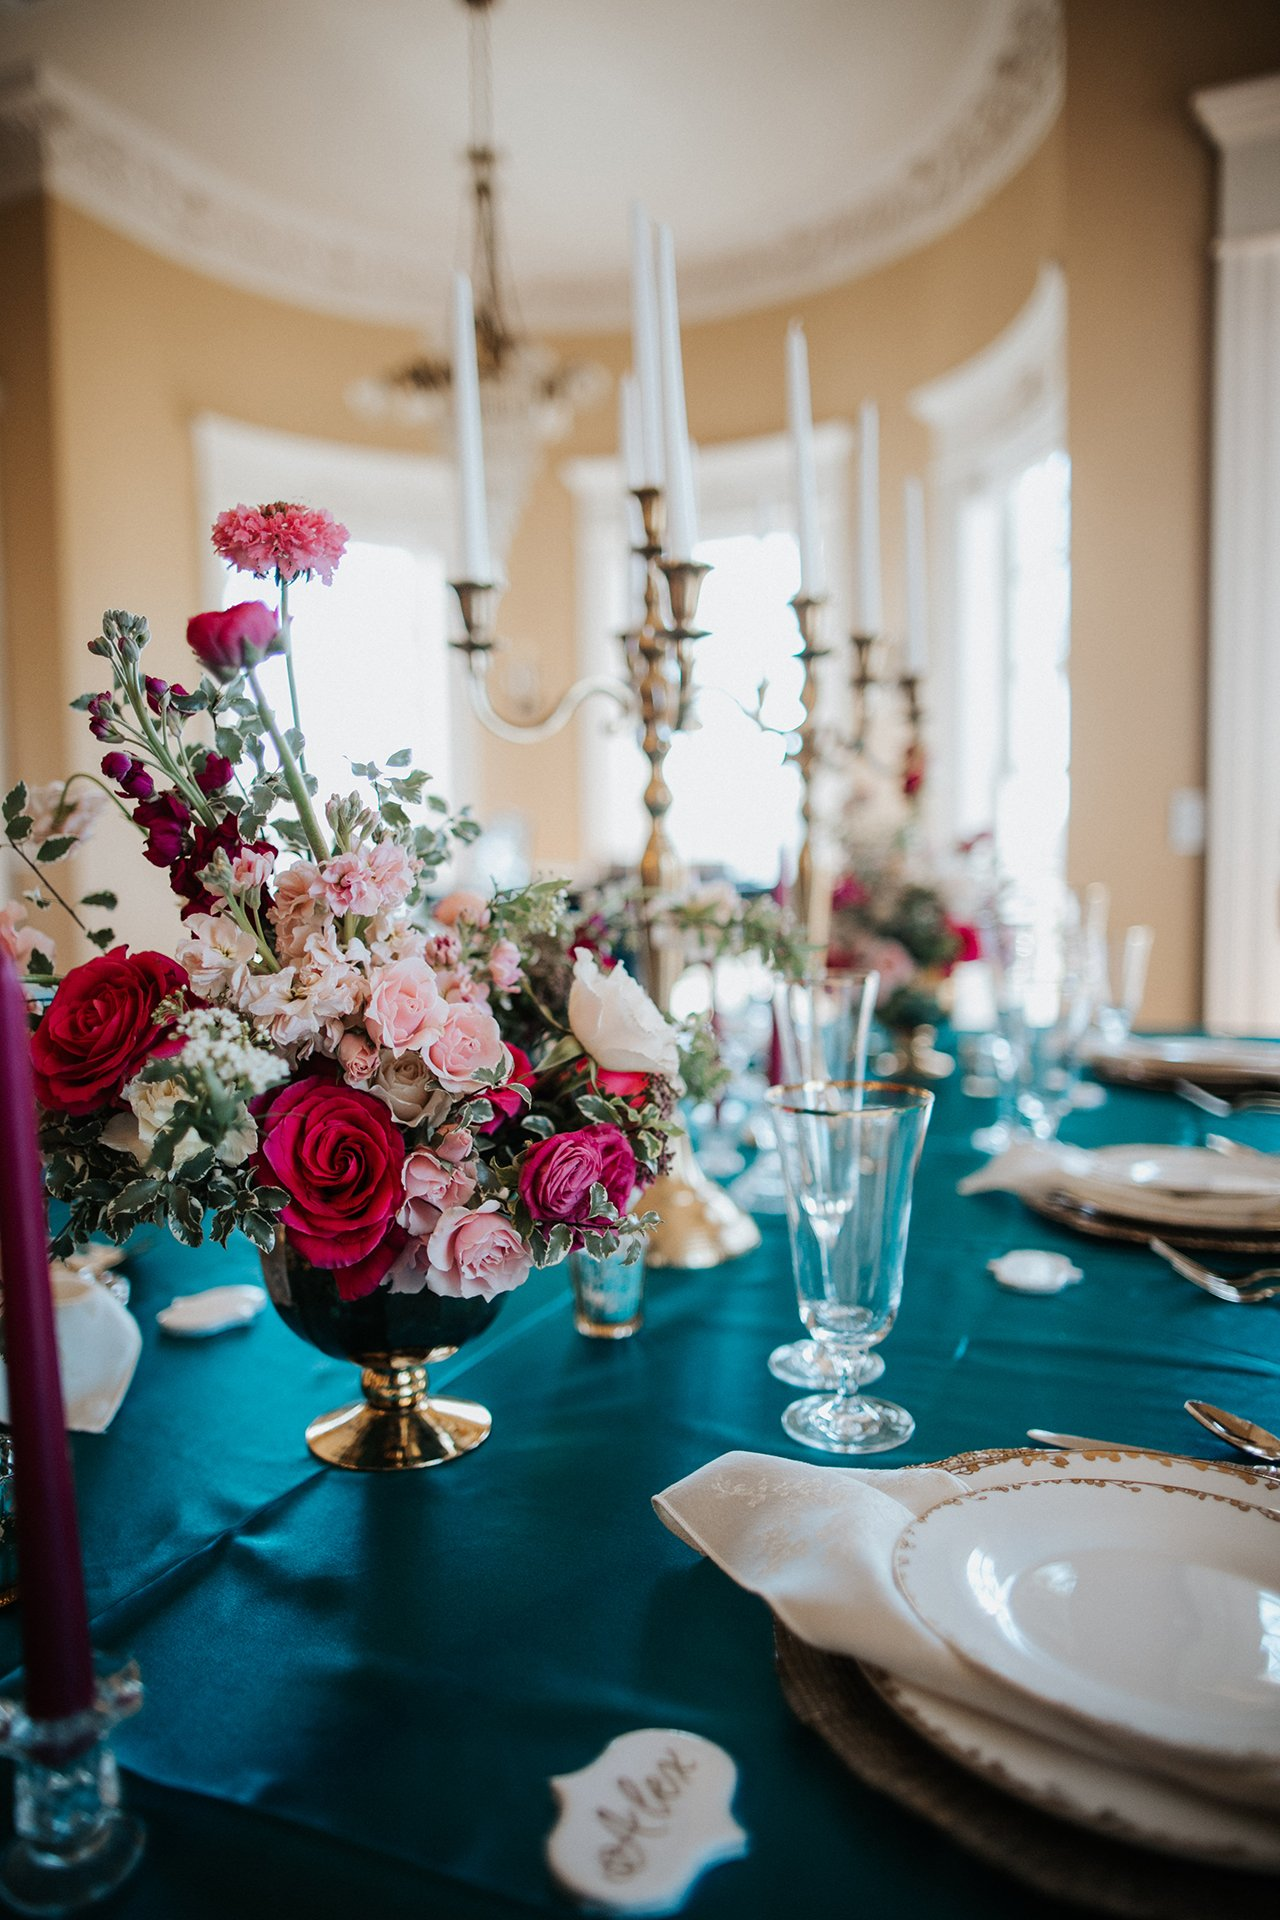 Sandlewood-Manor-Houston-Texas-Wedding-Styled-Shoot-Rkm-Photography_287_of_37229